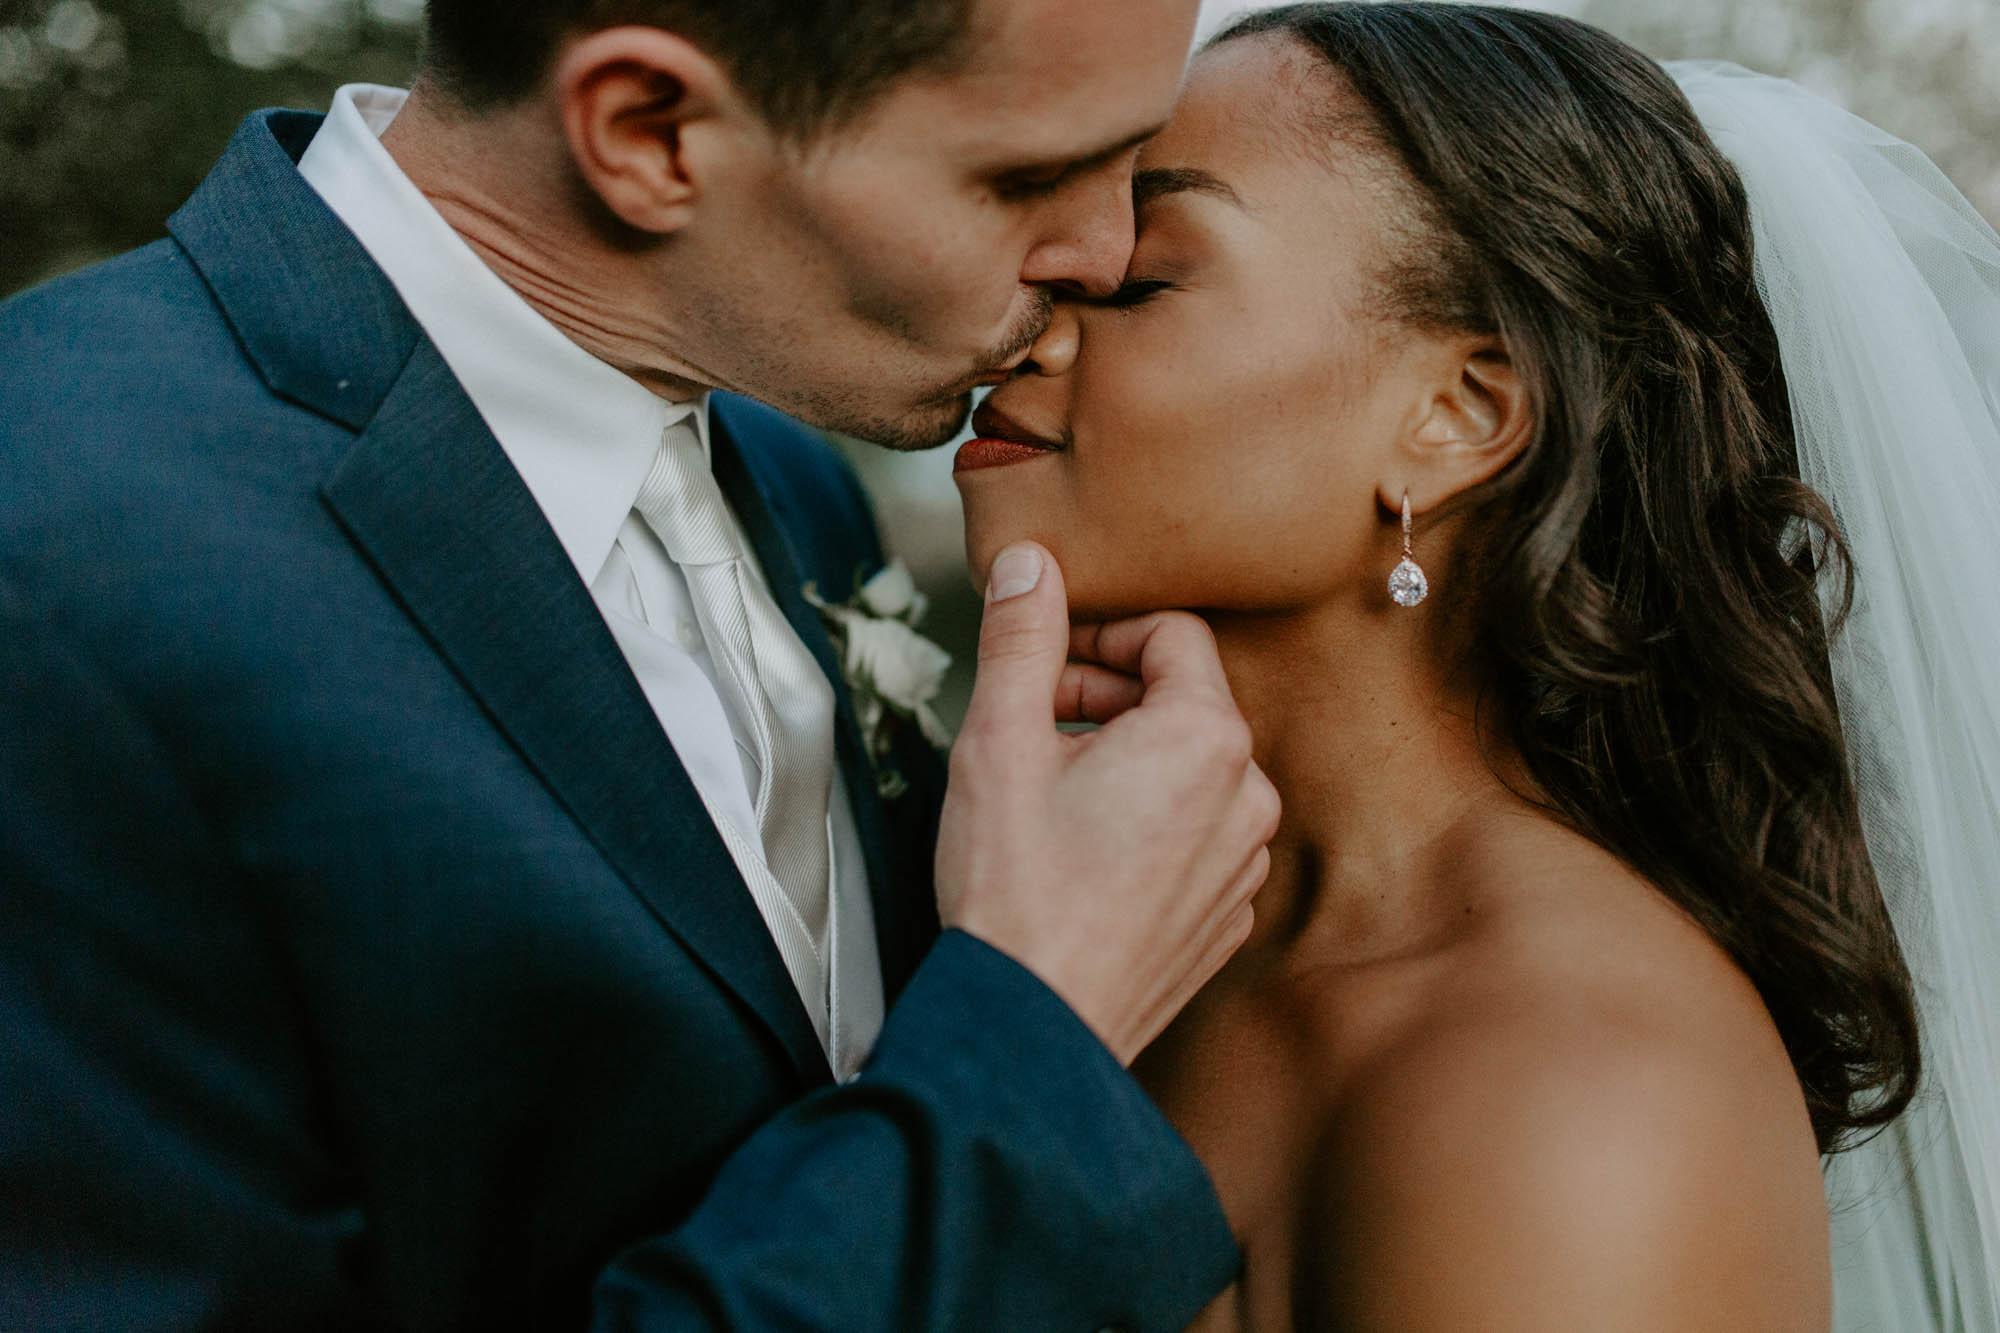 prairie_glass_house_wedding_champaign_wright_photographs_simon_0093.jpg